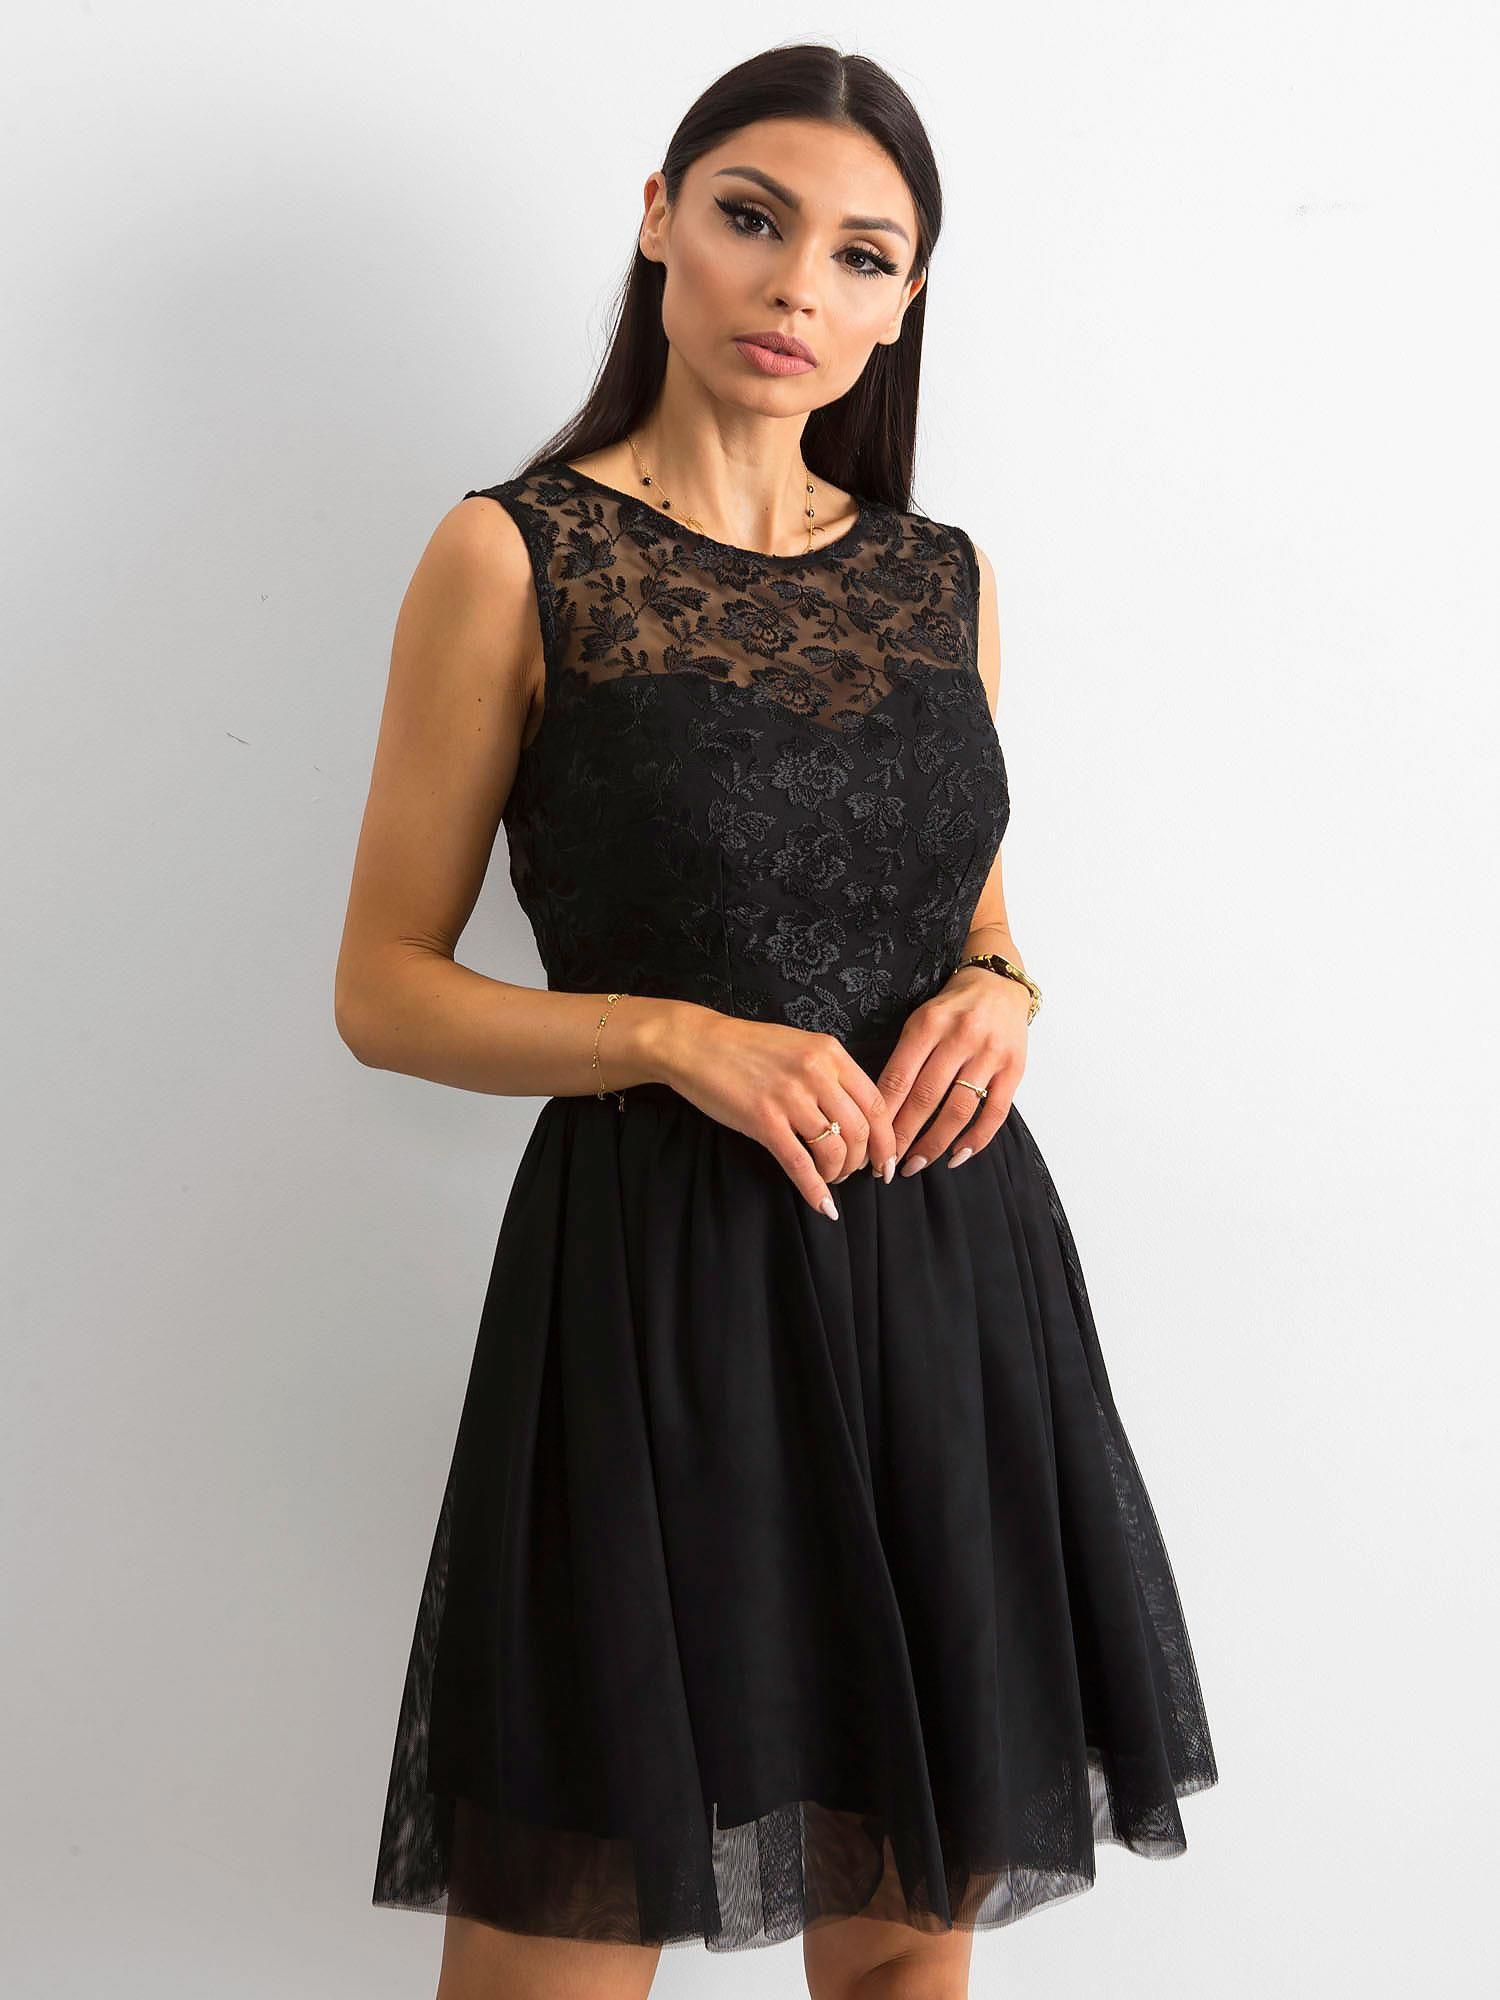 fb91143a2fc19f Elegancka sukienka z koronką czarna - Sukienka wieczorowa - sklep eButik.pl